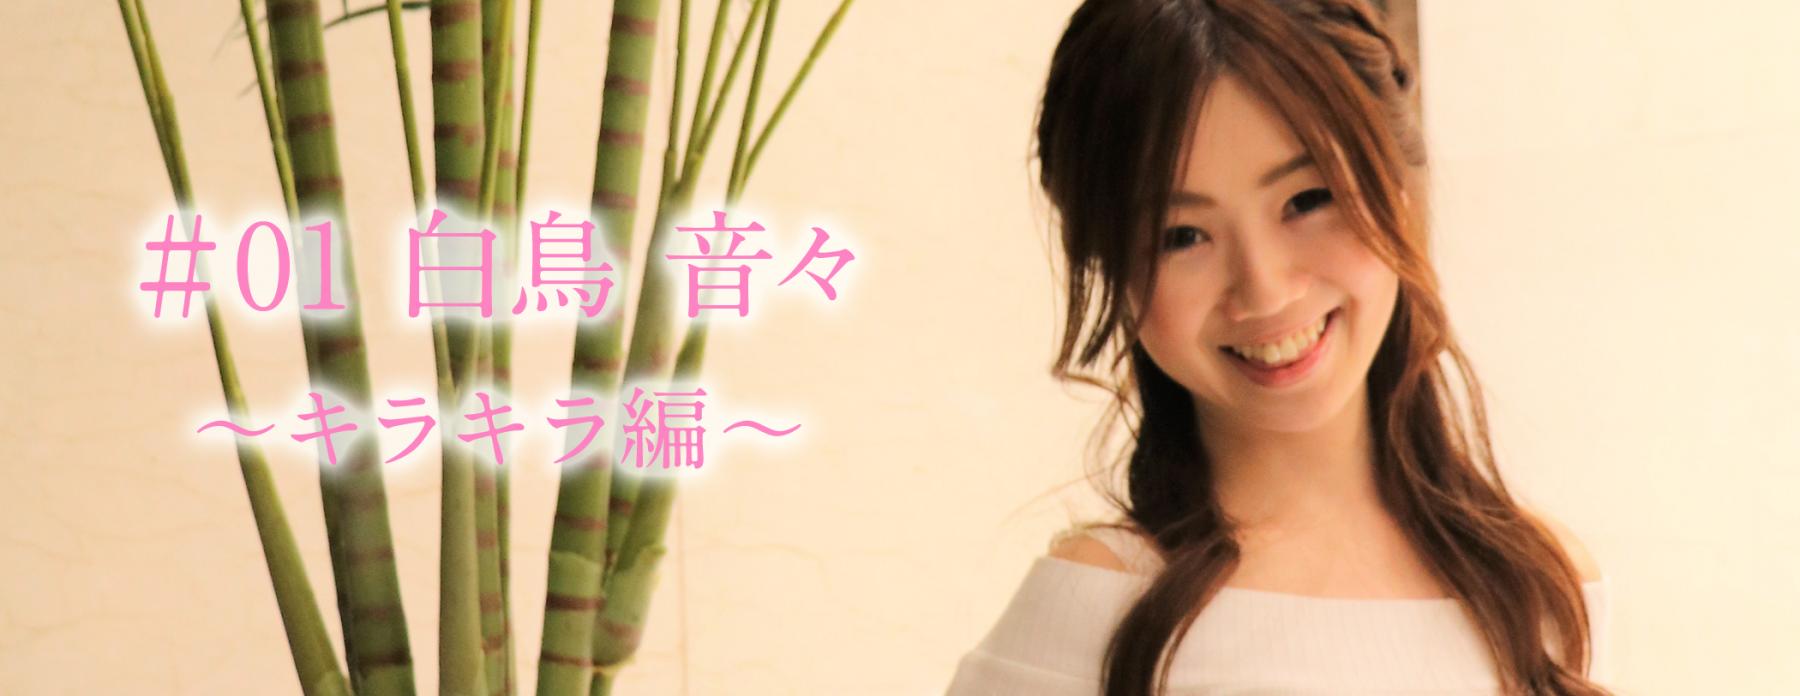 【CCLキラキャリ図鑑】#01 白鳥音々(シラトリネネ) ~キラキラ編~